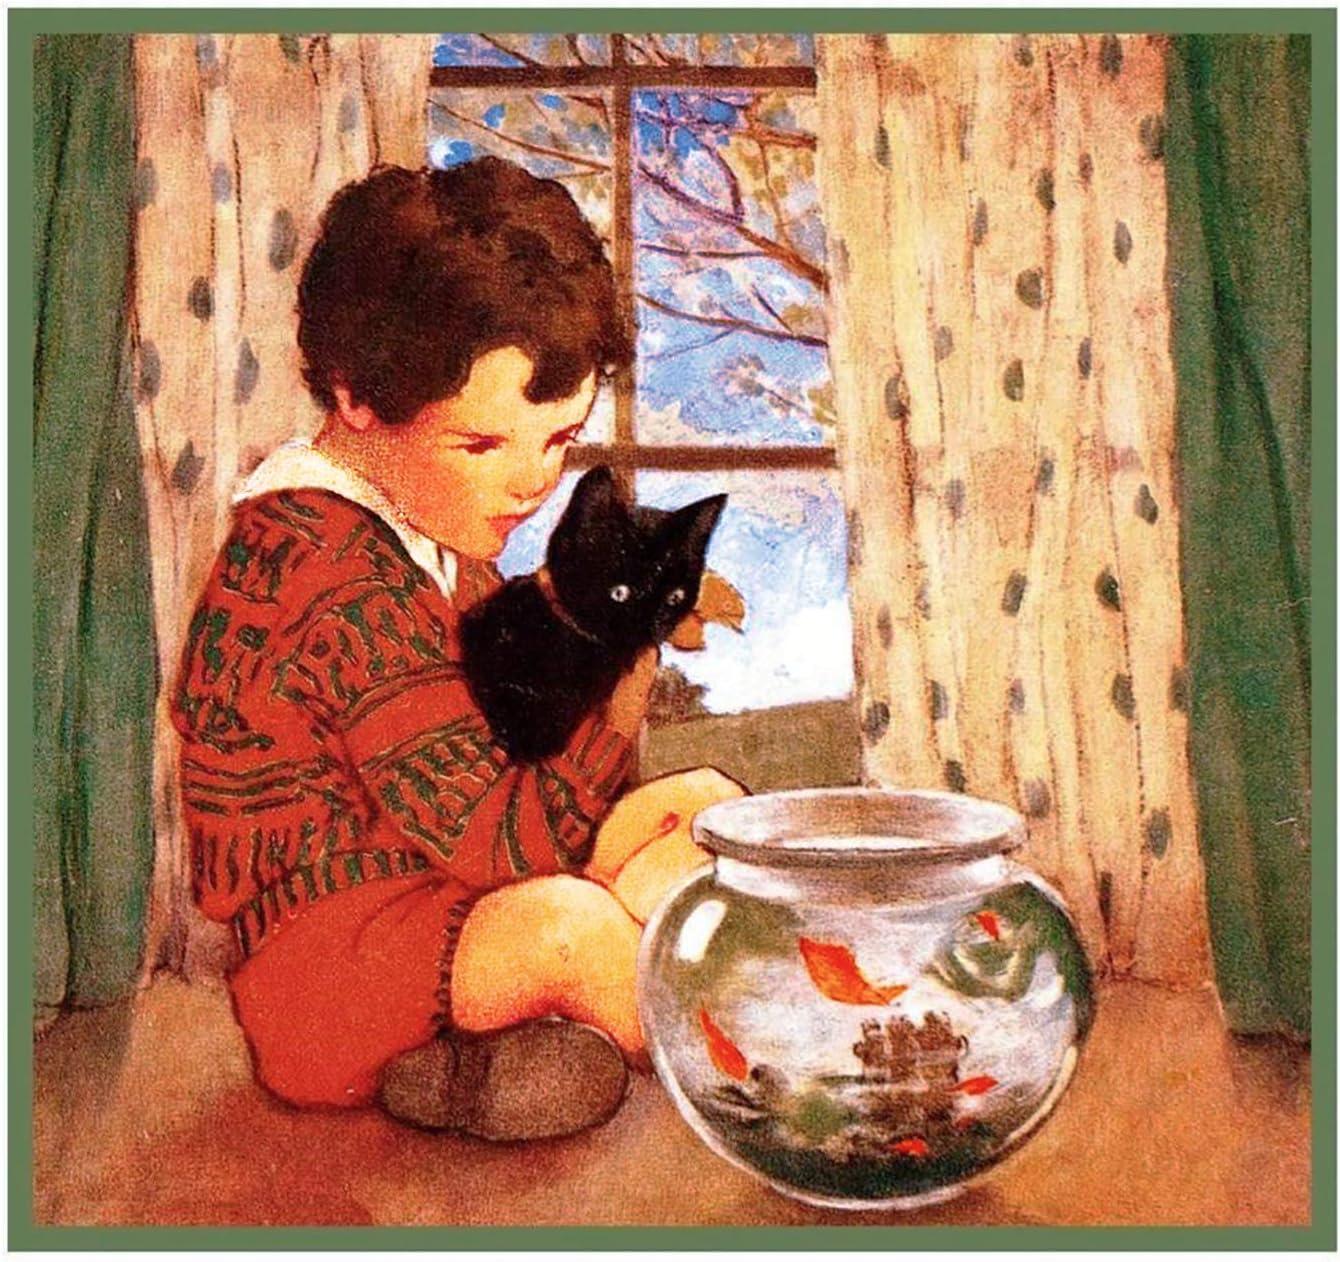 Jessie Willcox Smith Child Kitten Goldfish Bowl Count Cross Stitch Chart Pattern